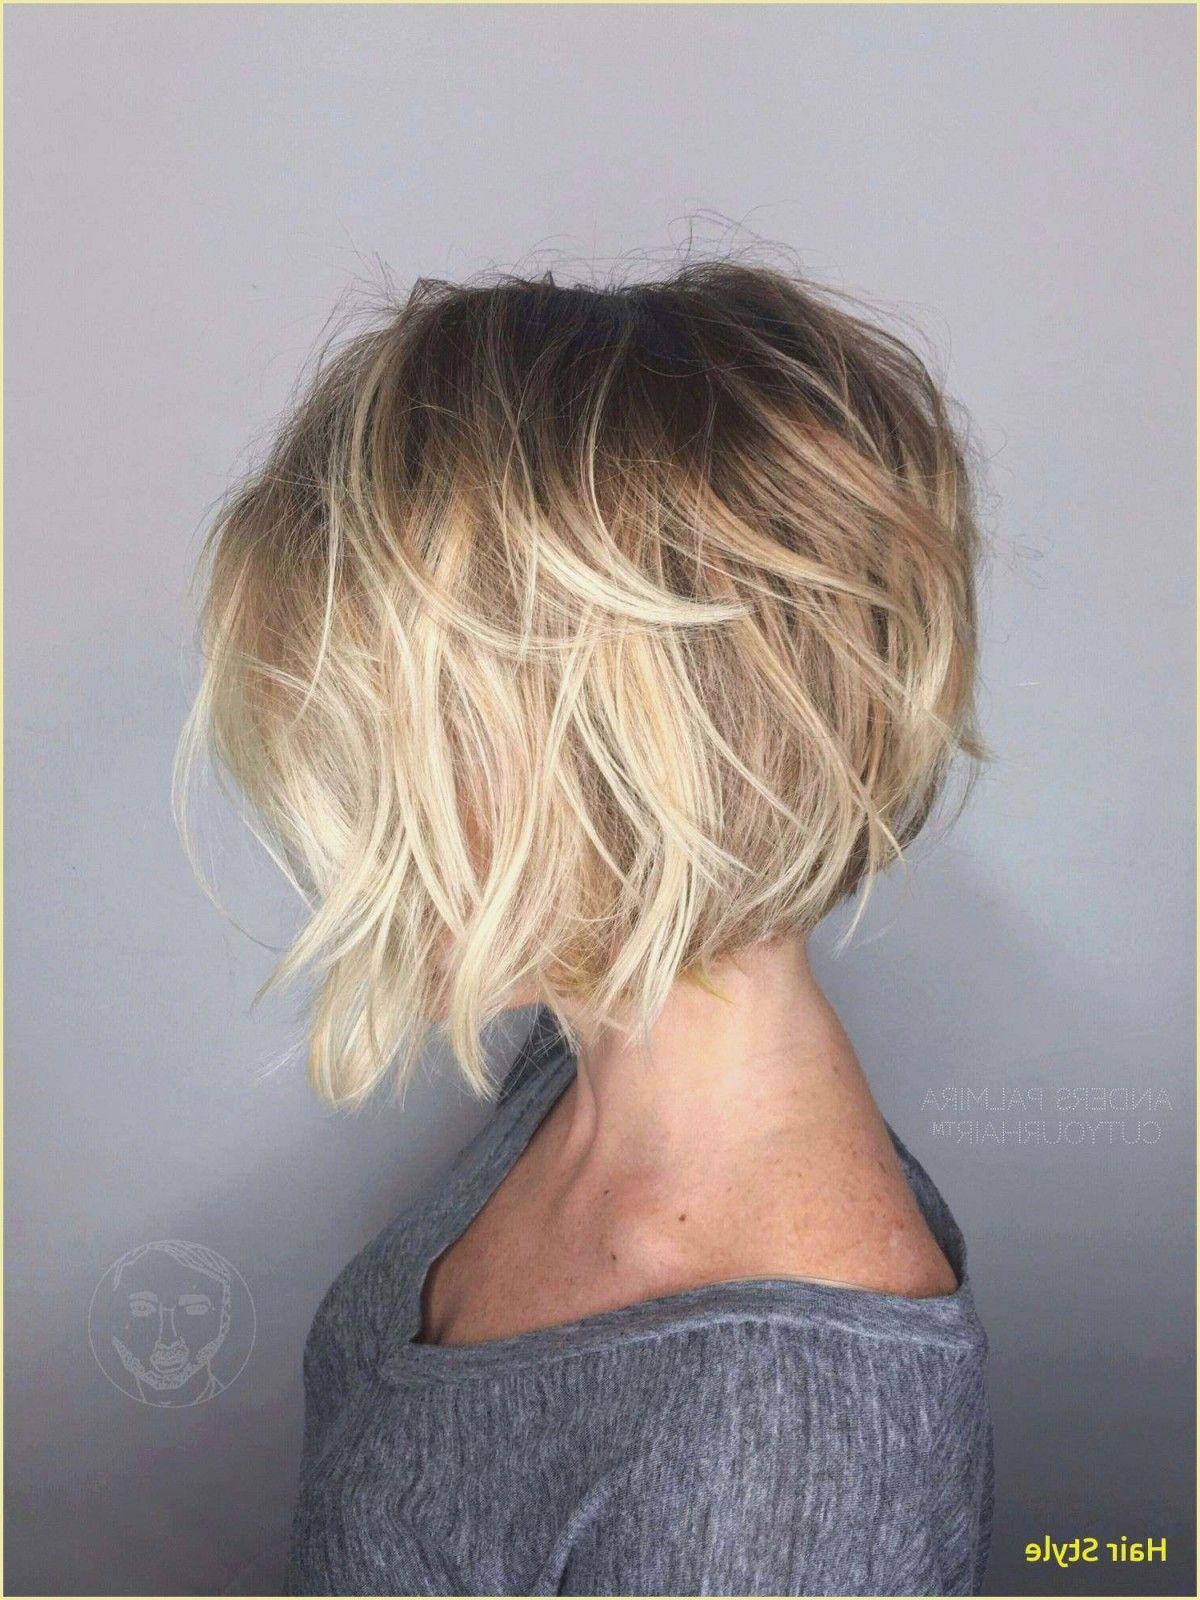 Best Of Frisuren Herbst Winter 2019 Blonde Bob Hairstyles Messy Blonde Bob Choppy Bob Hairstyles